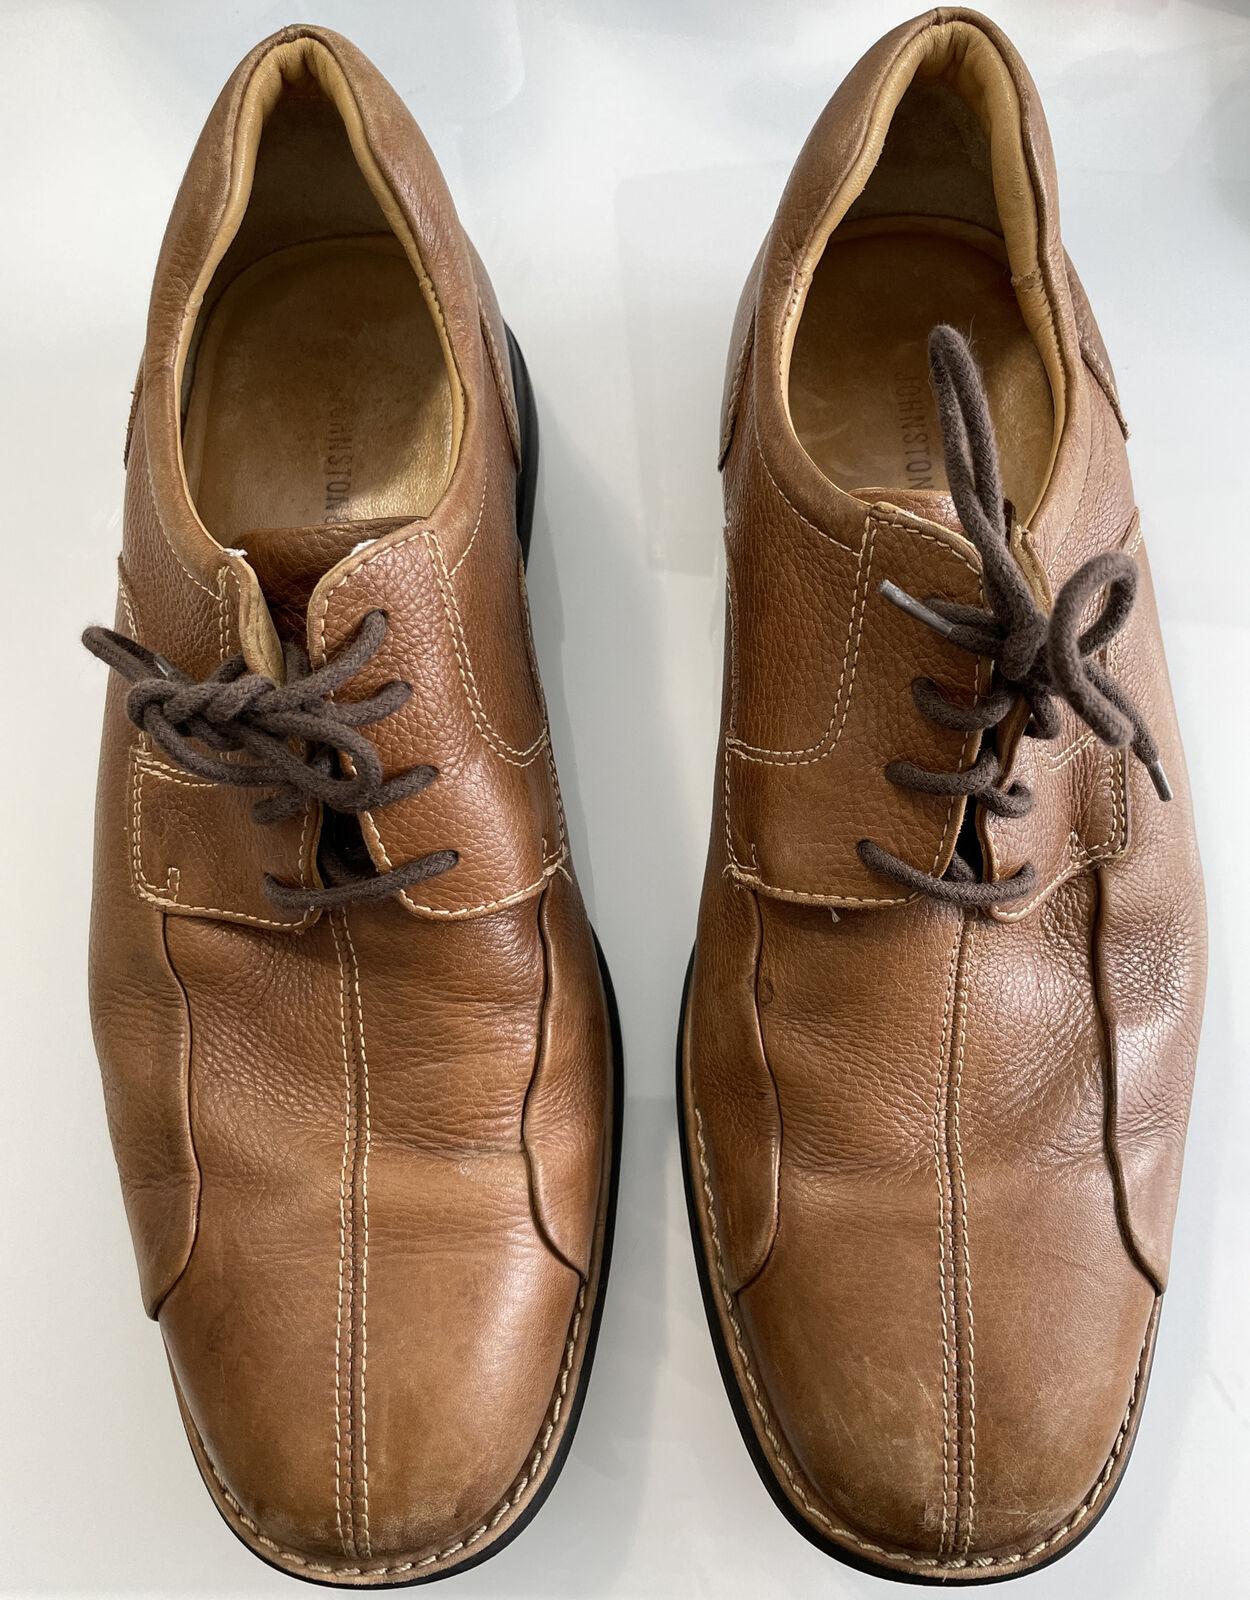 Johnston & Murphy Oxford Dress Shoes Leather Lace Up Comfort Shoe Men's Size 11